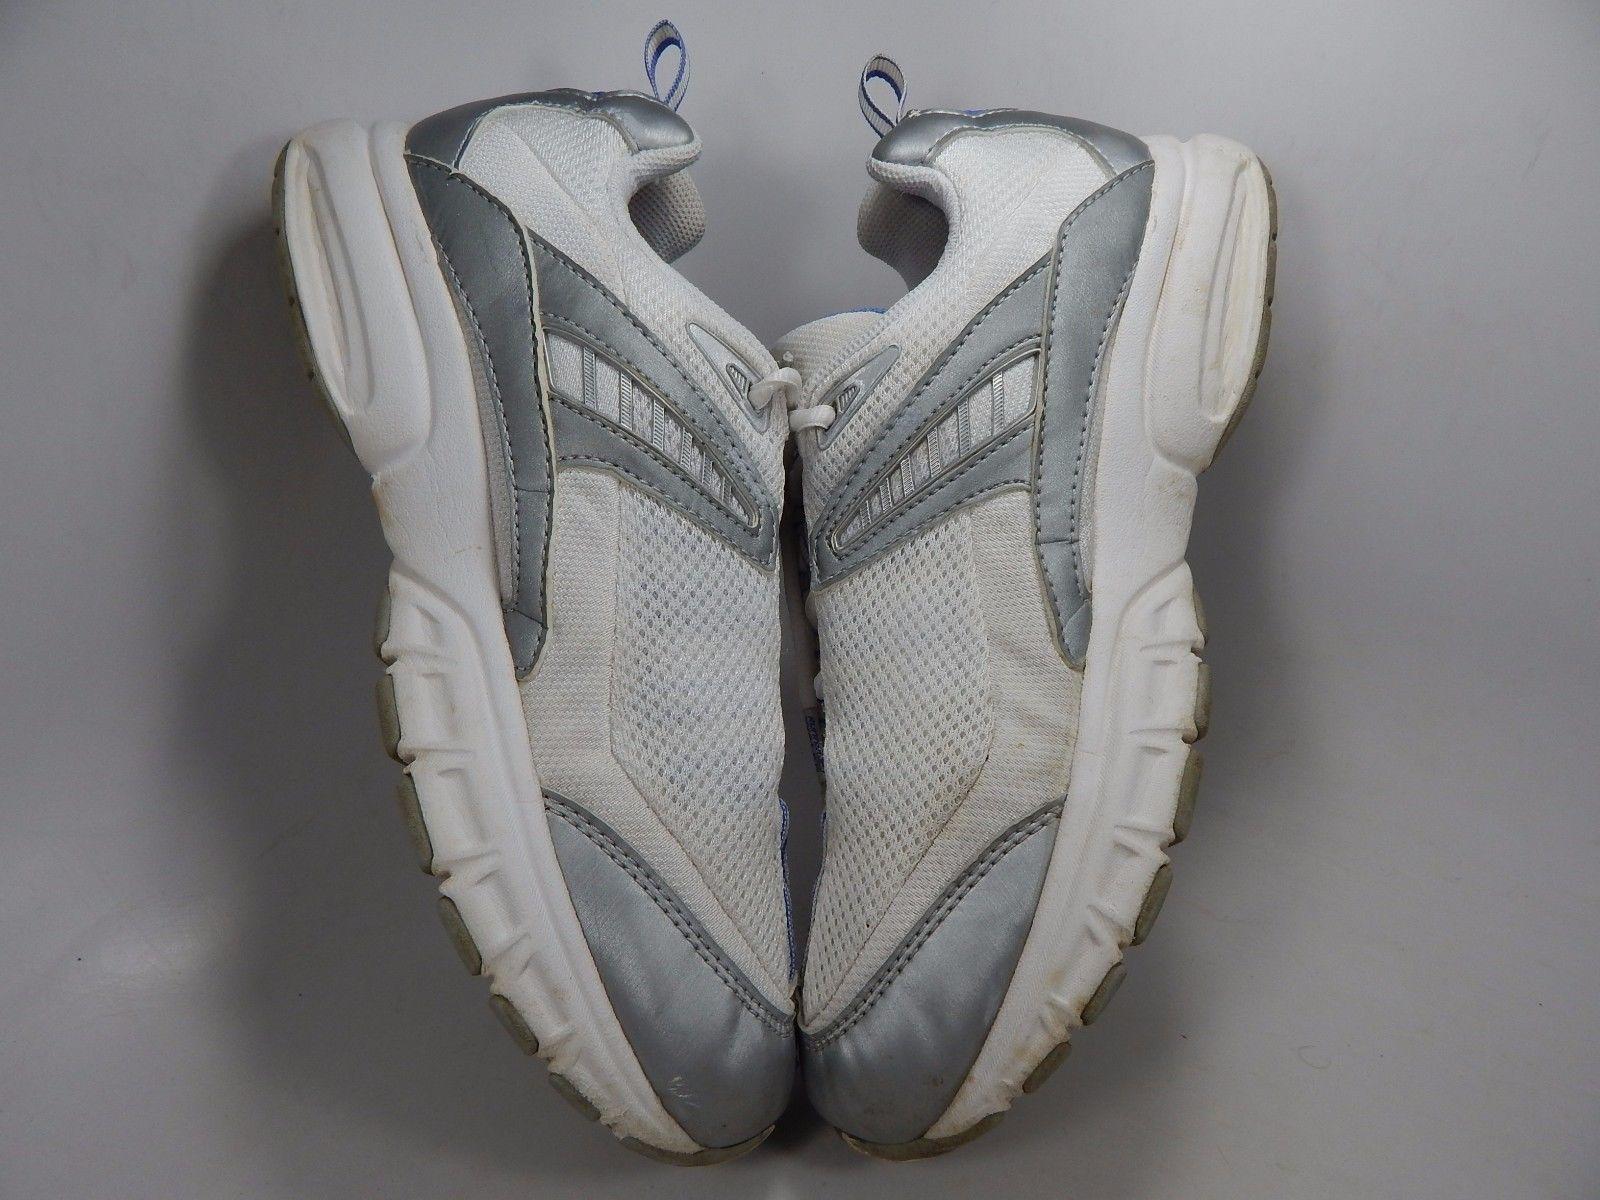 Reebok DMX Foam Women's Sneaker Running Shoes Size US 8.5 M (B) EU 39 White